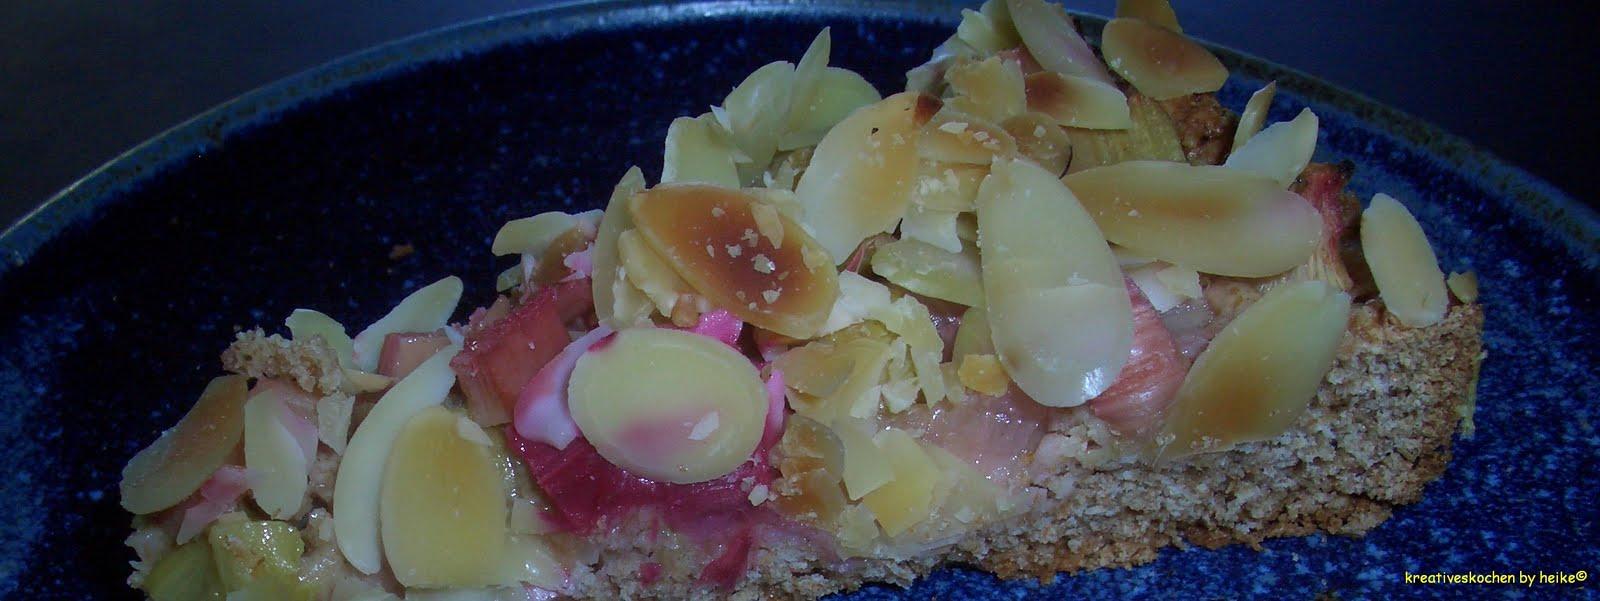 Kreatives kochen rhabarber geburtstagskuchen for Kochen rhabarber